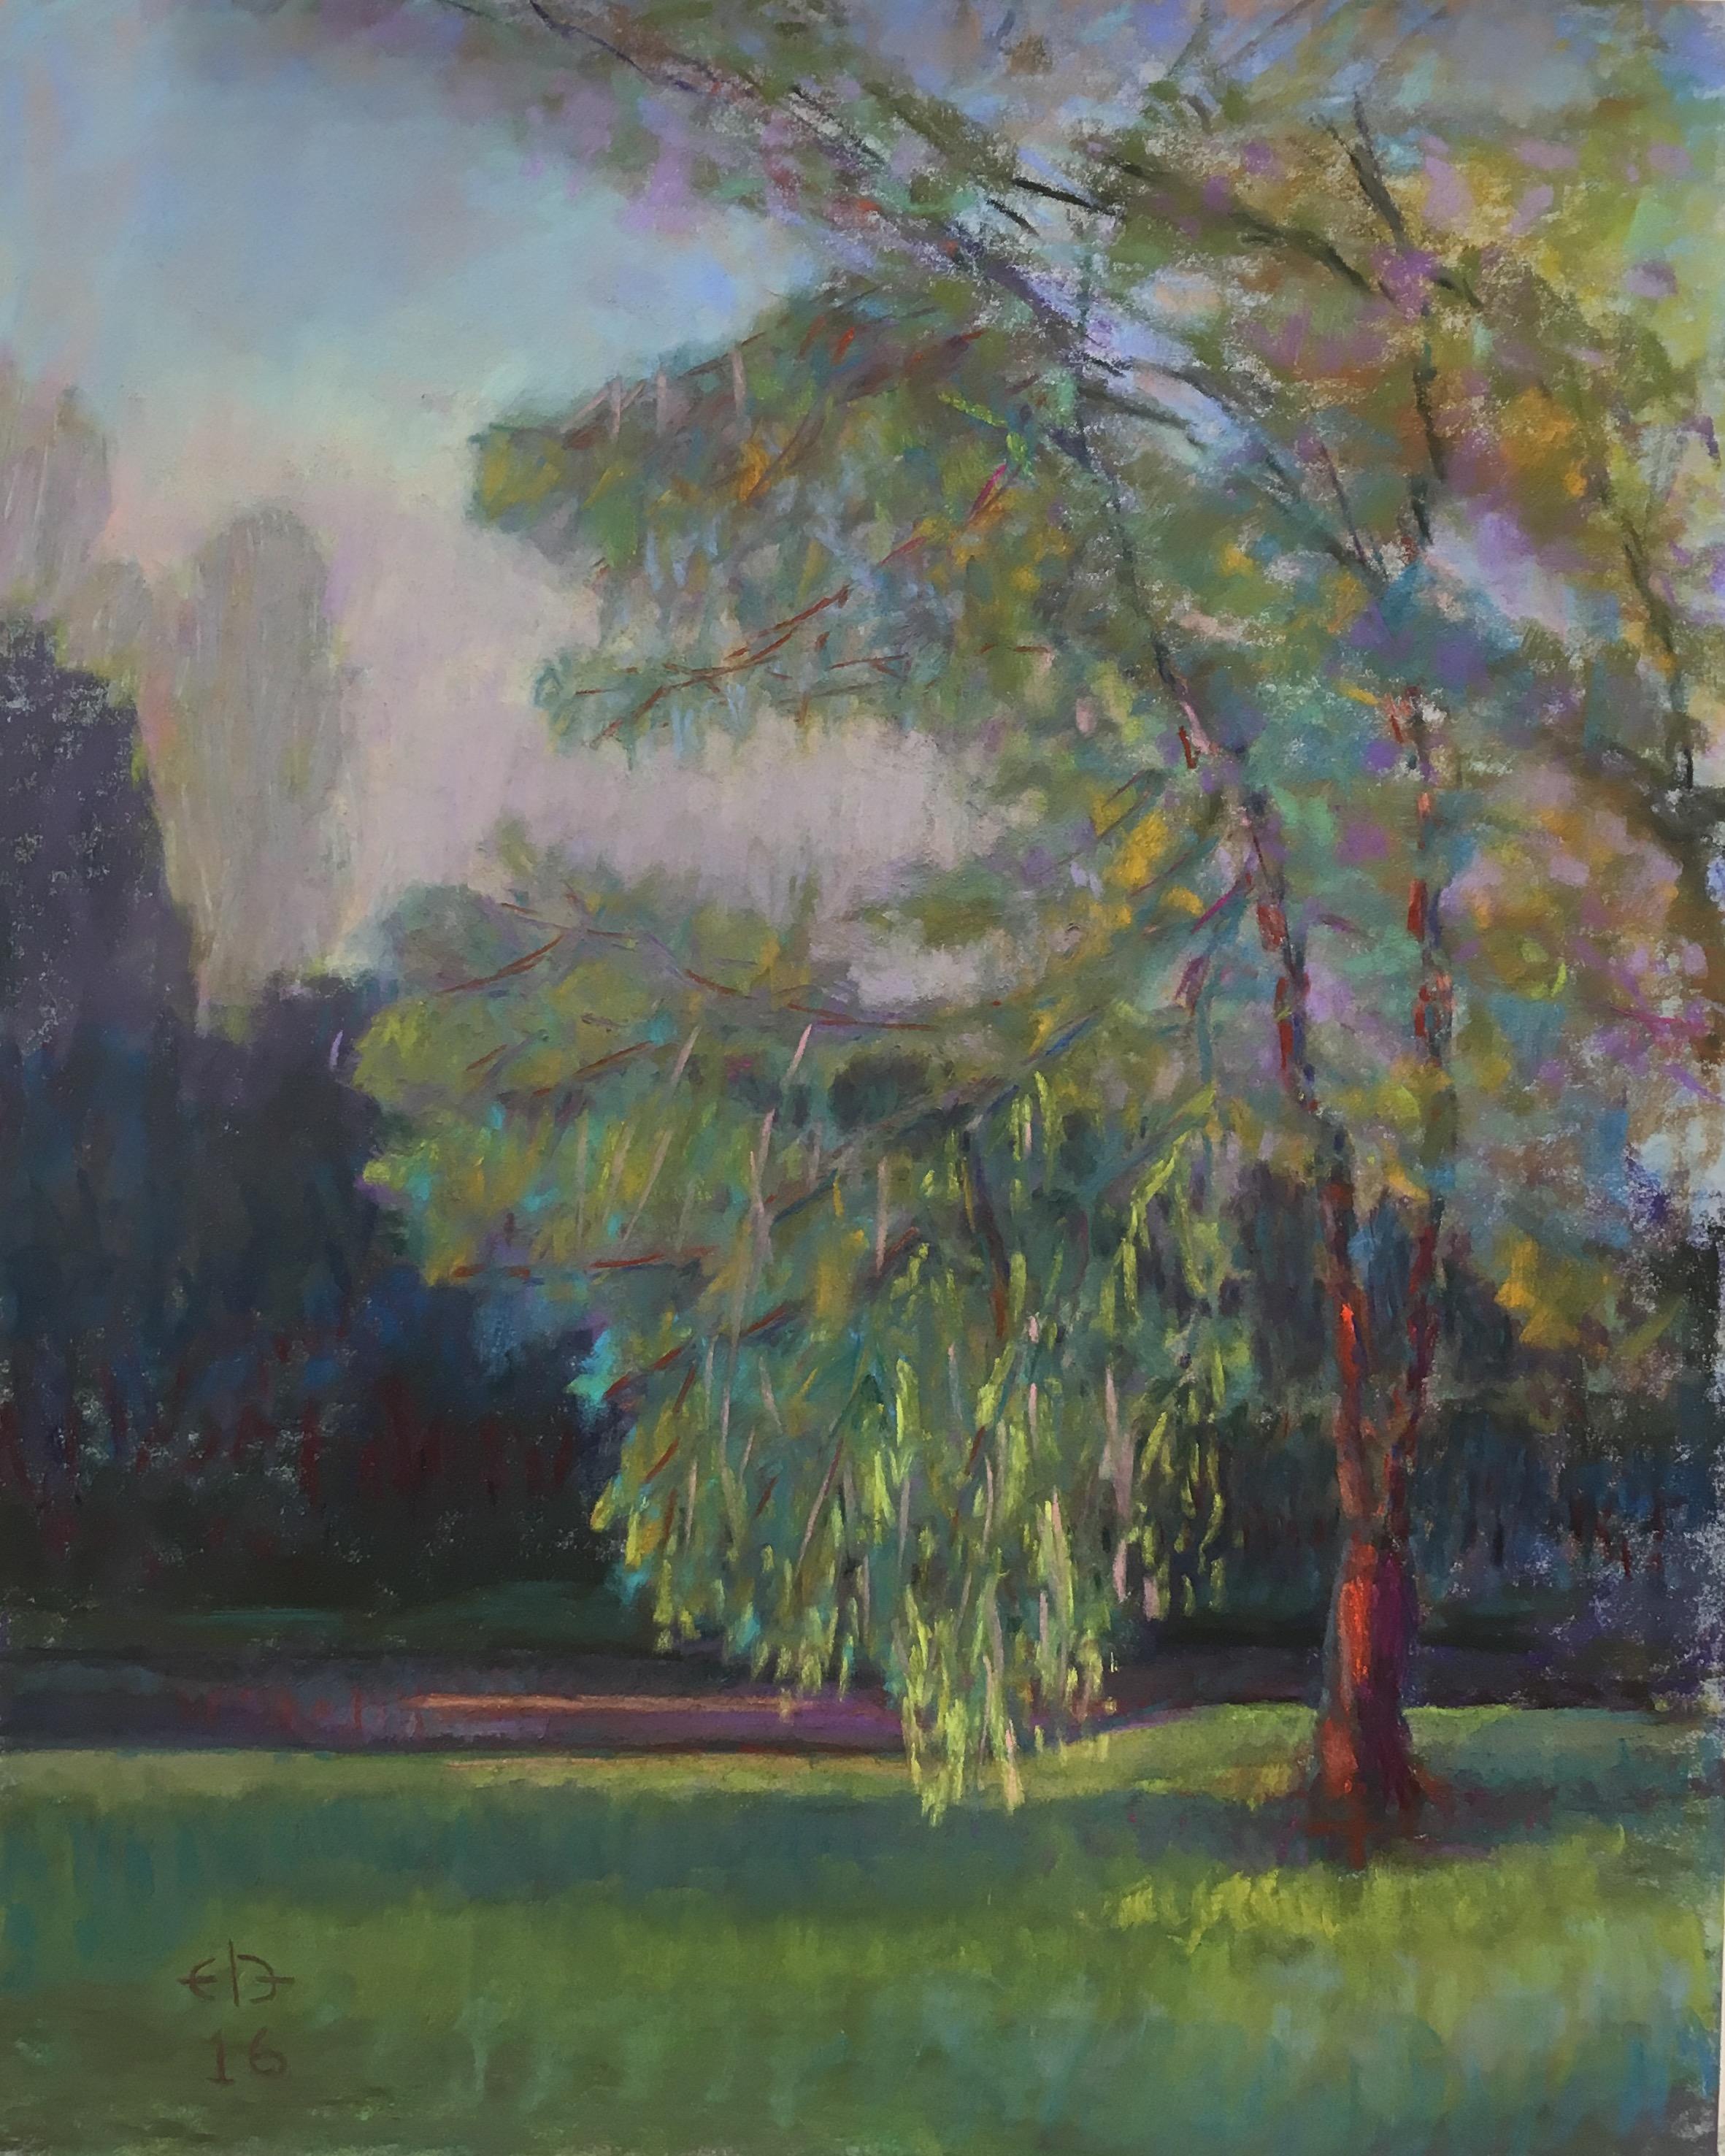 Sunrise Lincoln Park (2017) [Private Collection]